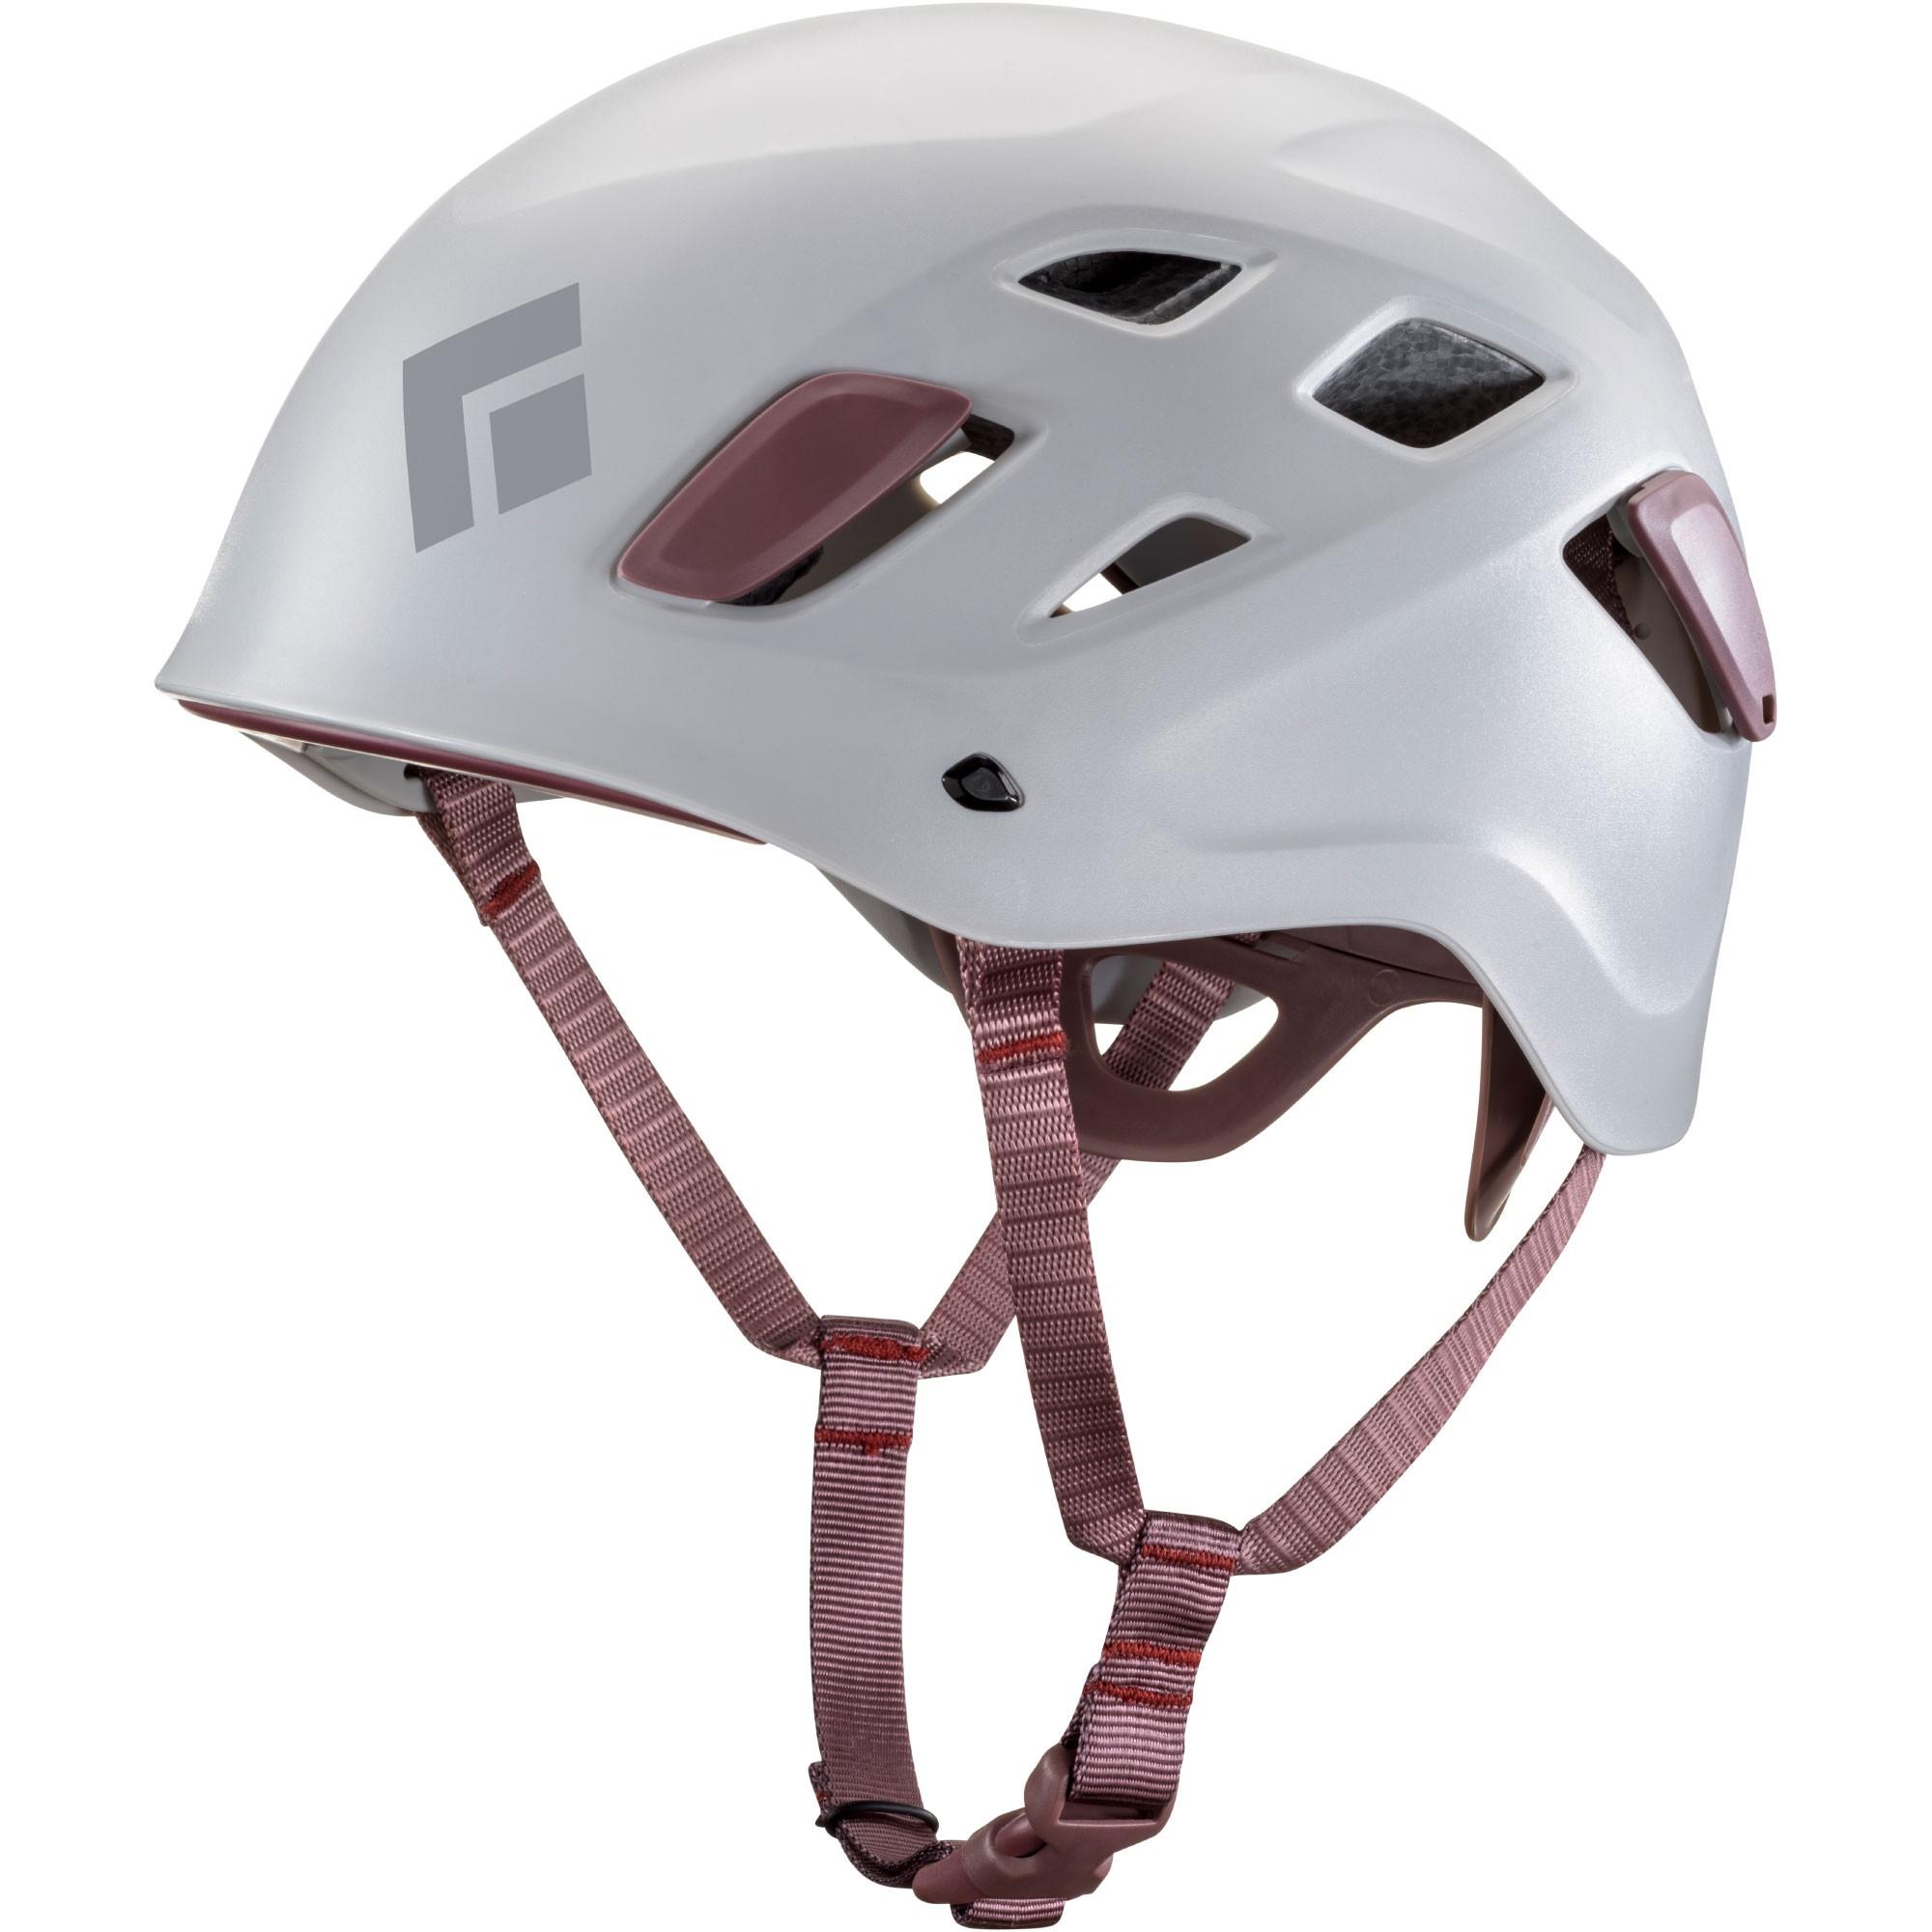 BLACK DIAMOND - Women's Half Dome Helmet